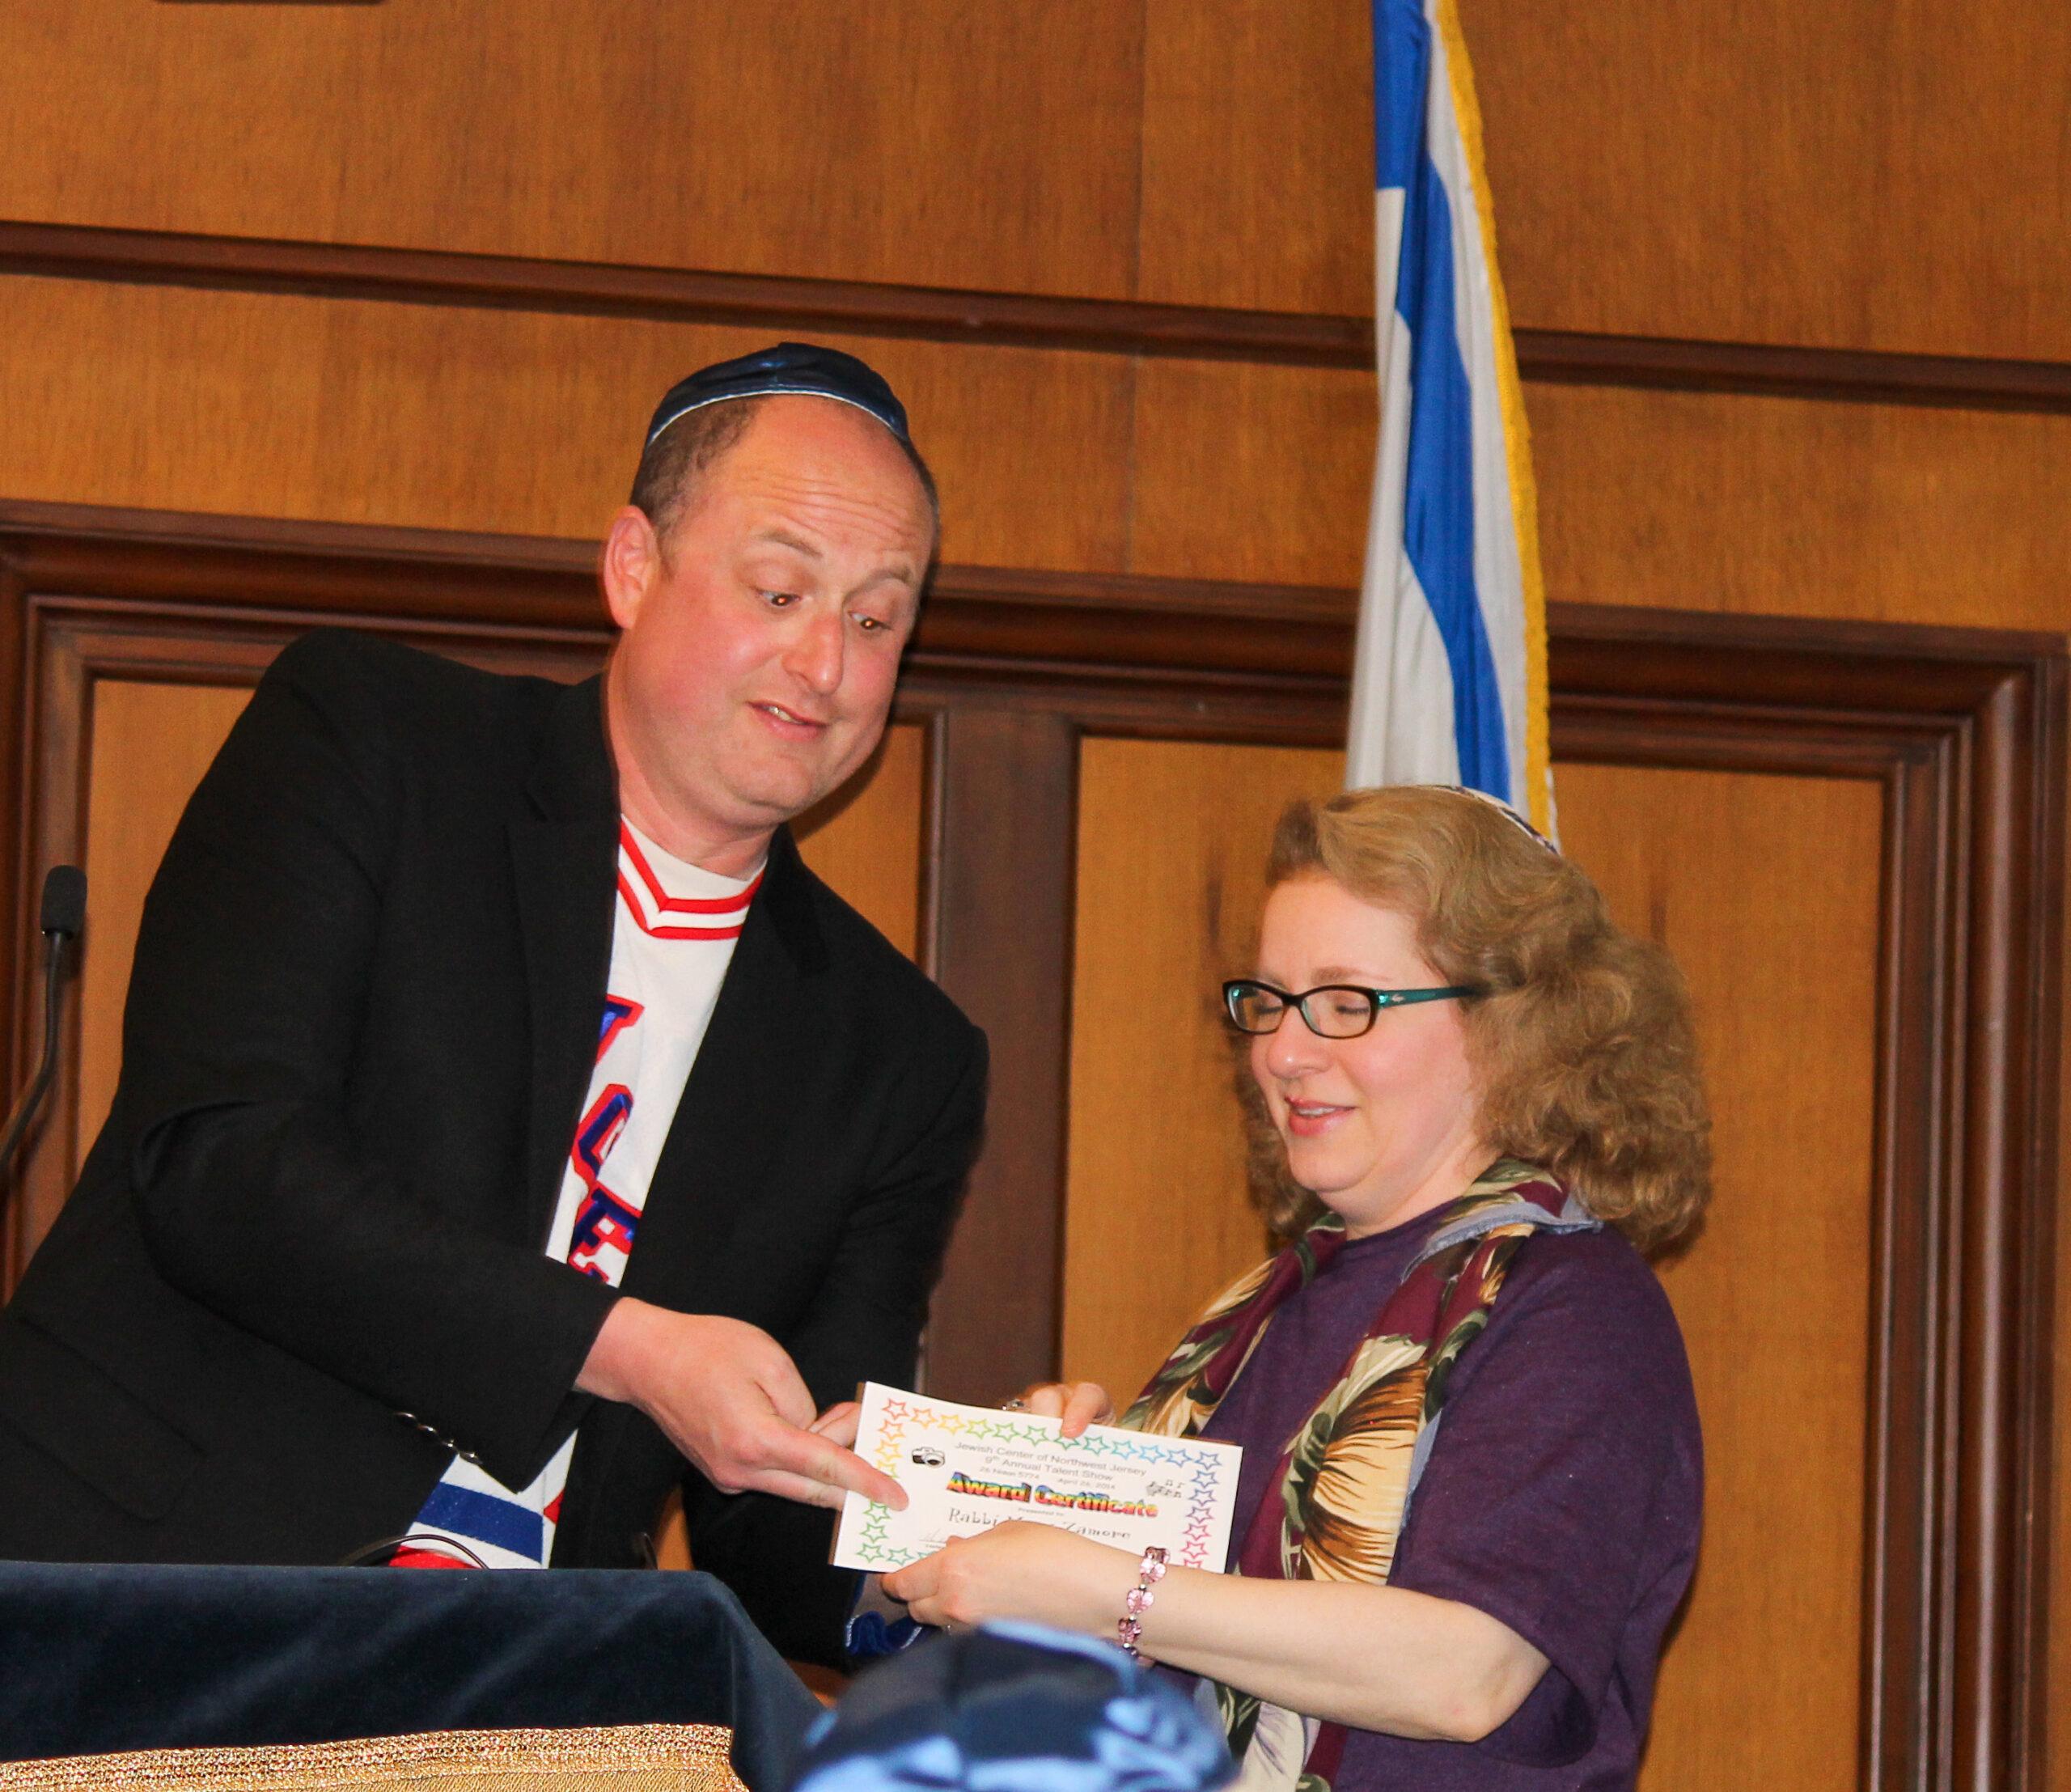 Brett Schaeffer and Rabbi Mary Zamore